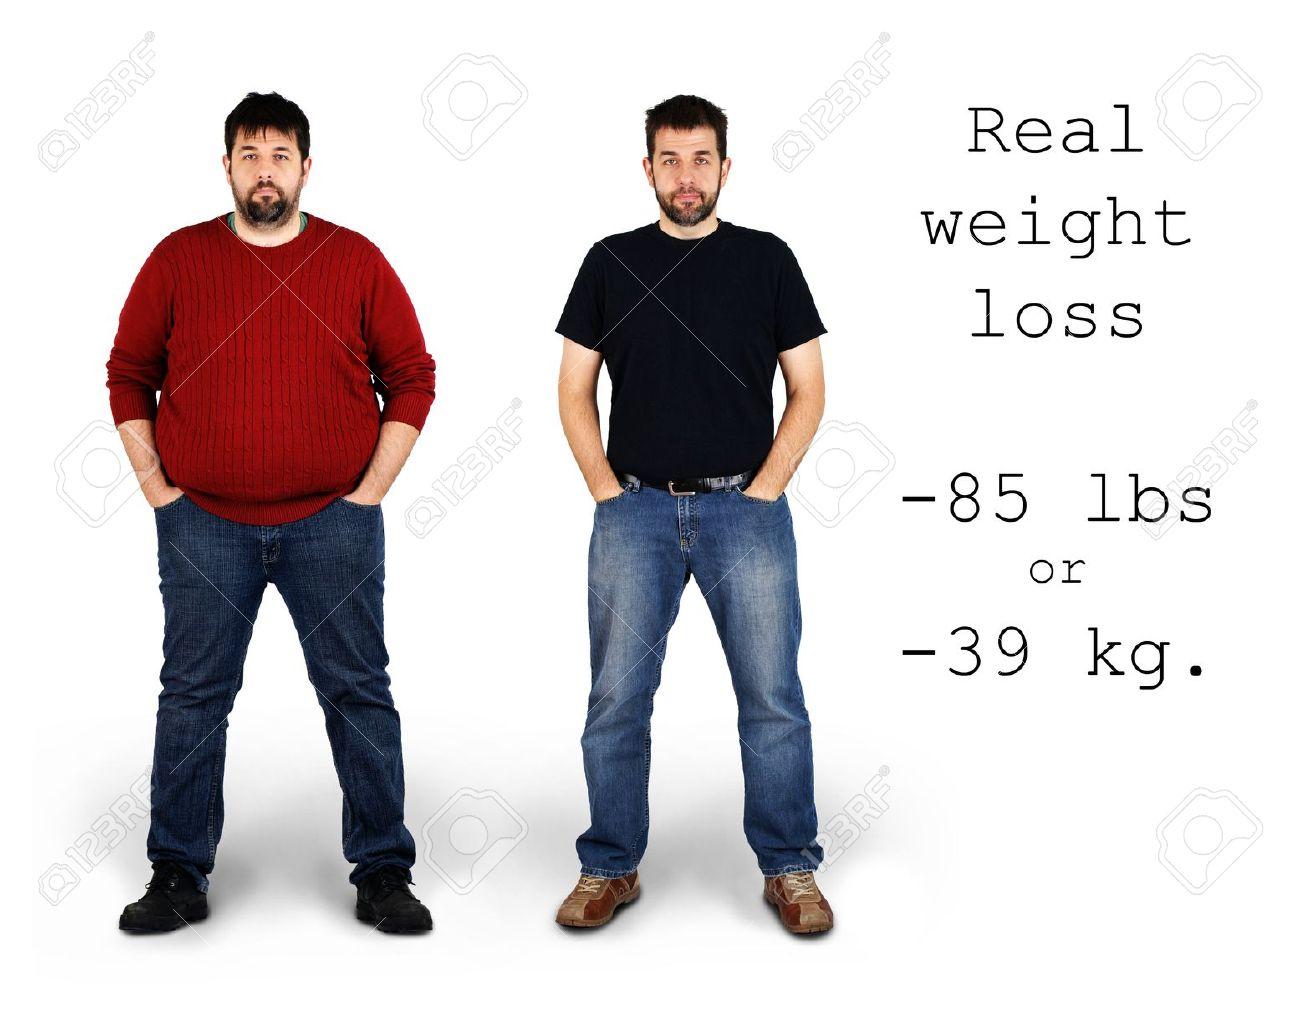 Libras a kilos peso ideal